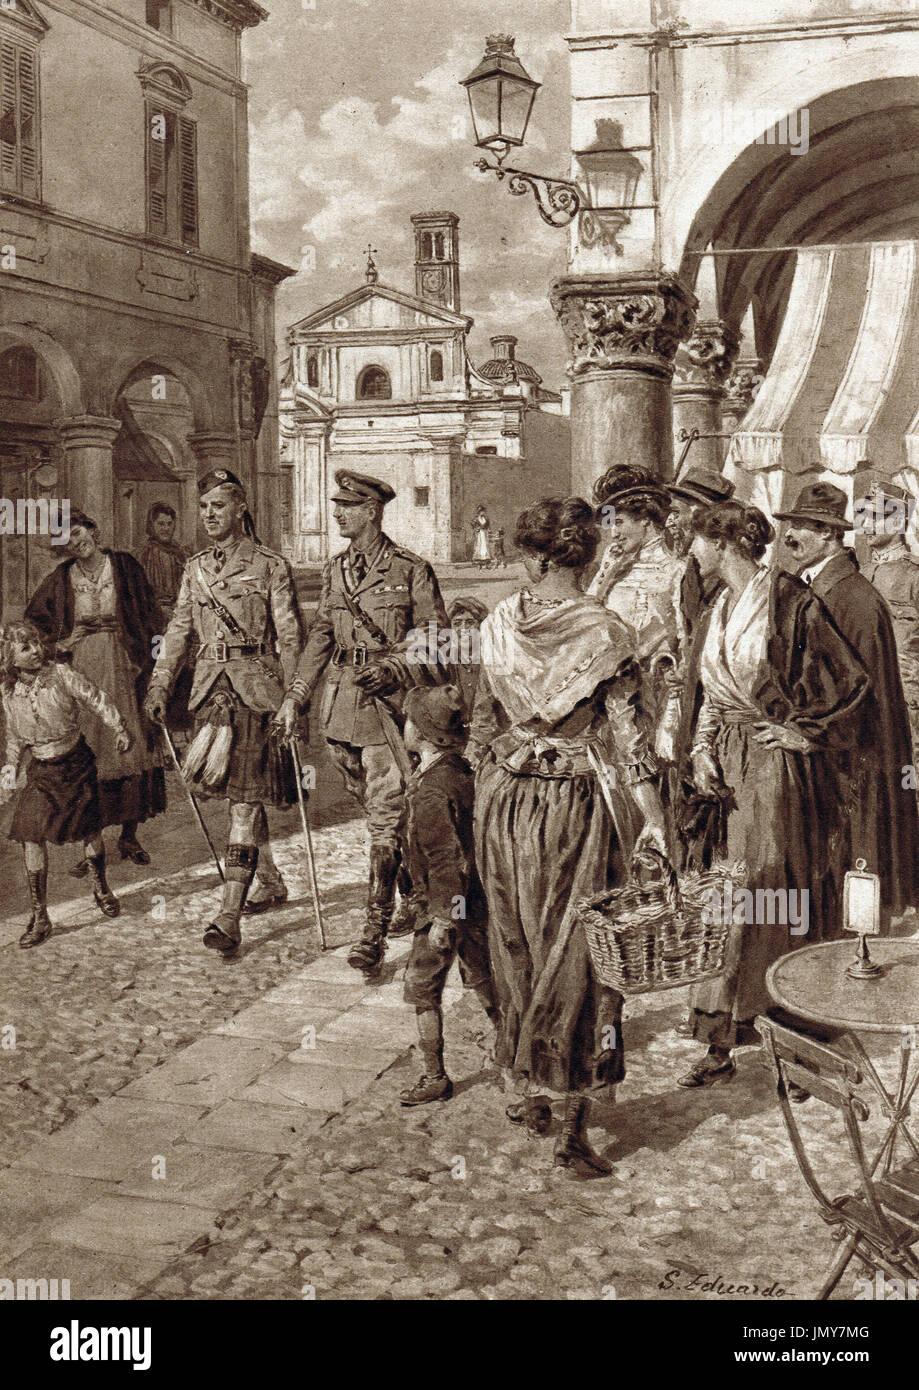 Scottish Kilt causing a stir in Italy, WW1 - Stock Image